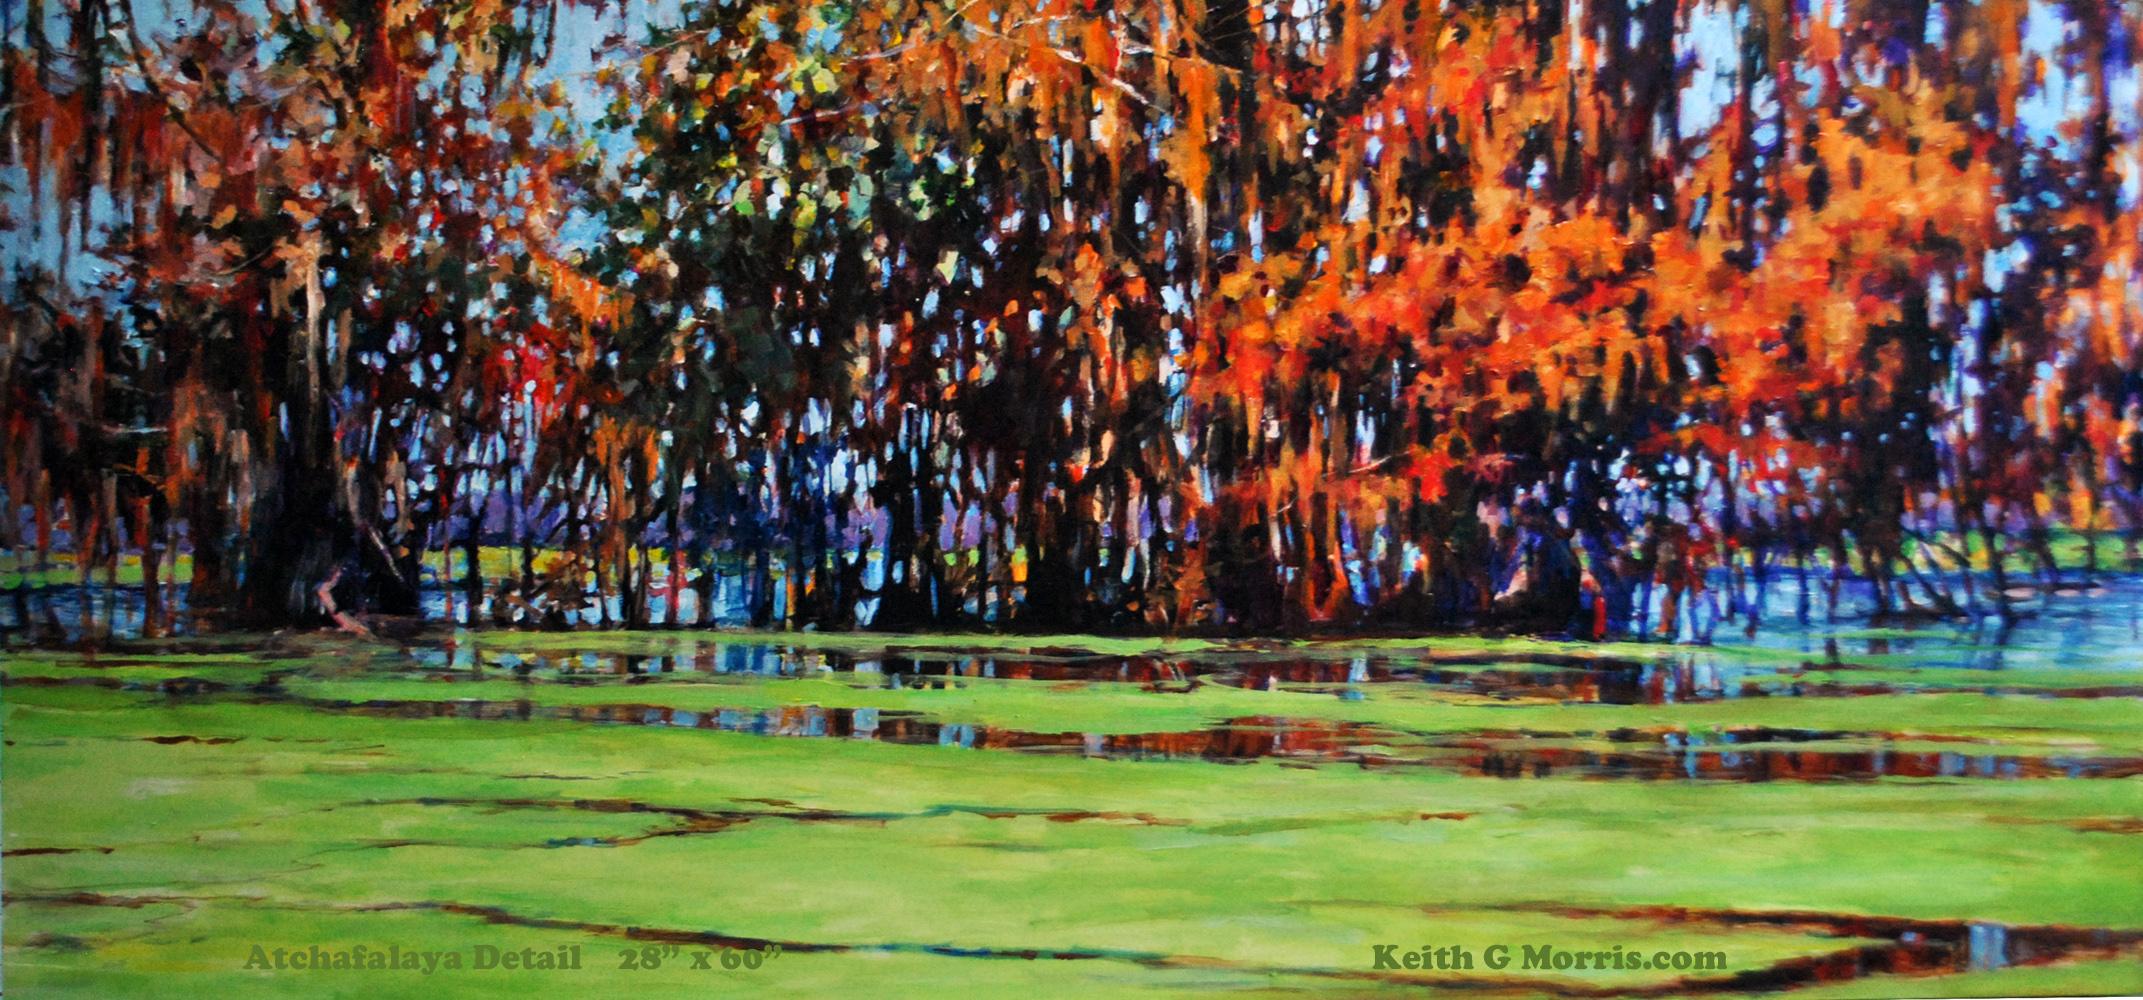 Keith G Morris | Louisiana Artist